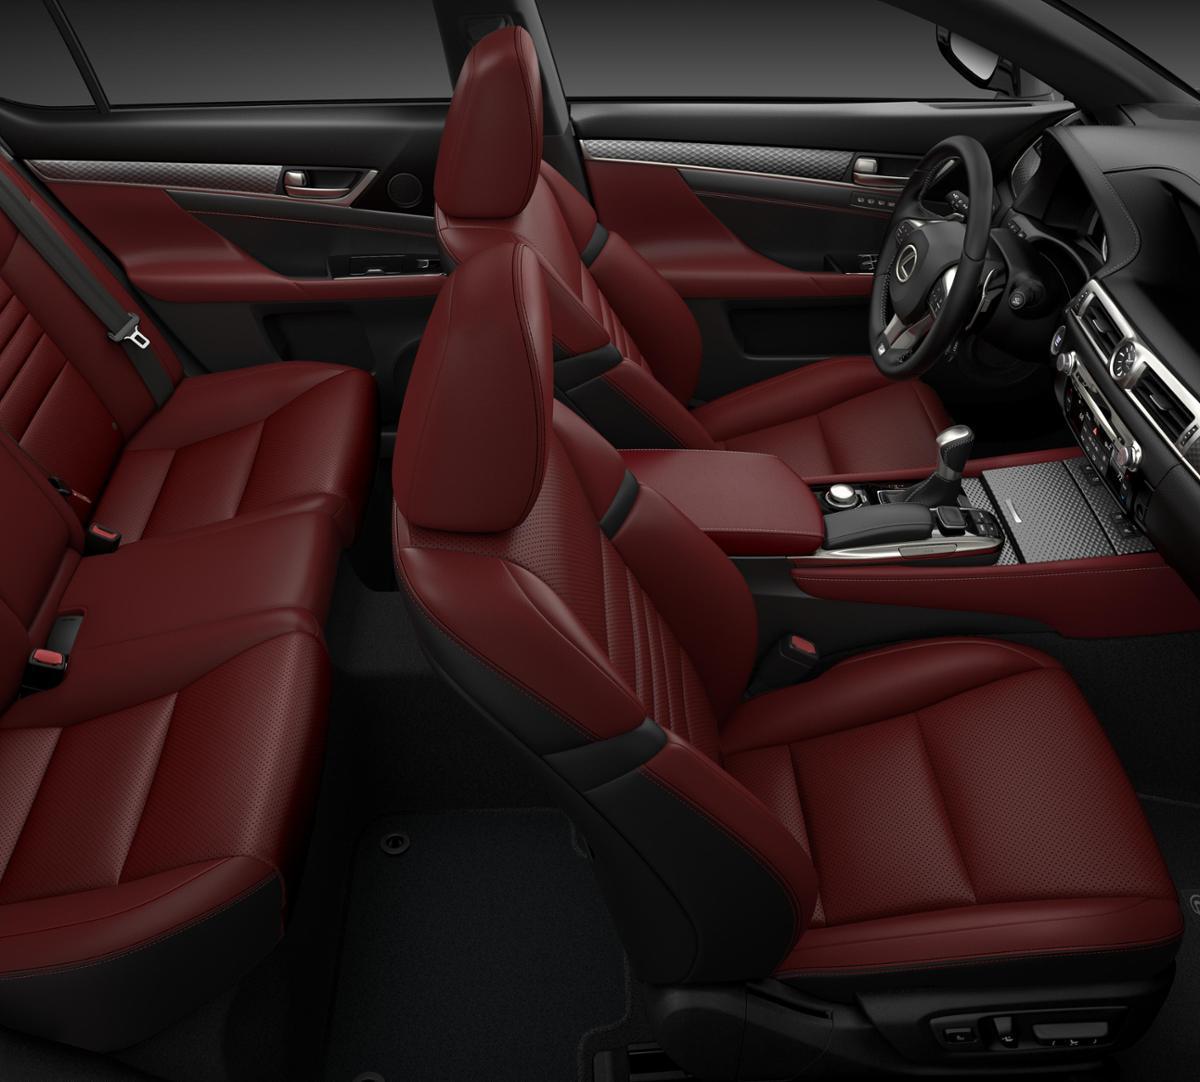 2014 Lexus Is F Sport For Sale: 2017 Smoky Granite Mica F SPORT Lexus GS 350 For Sale In